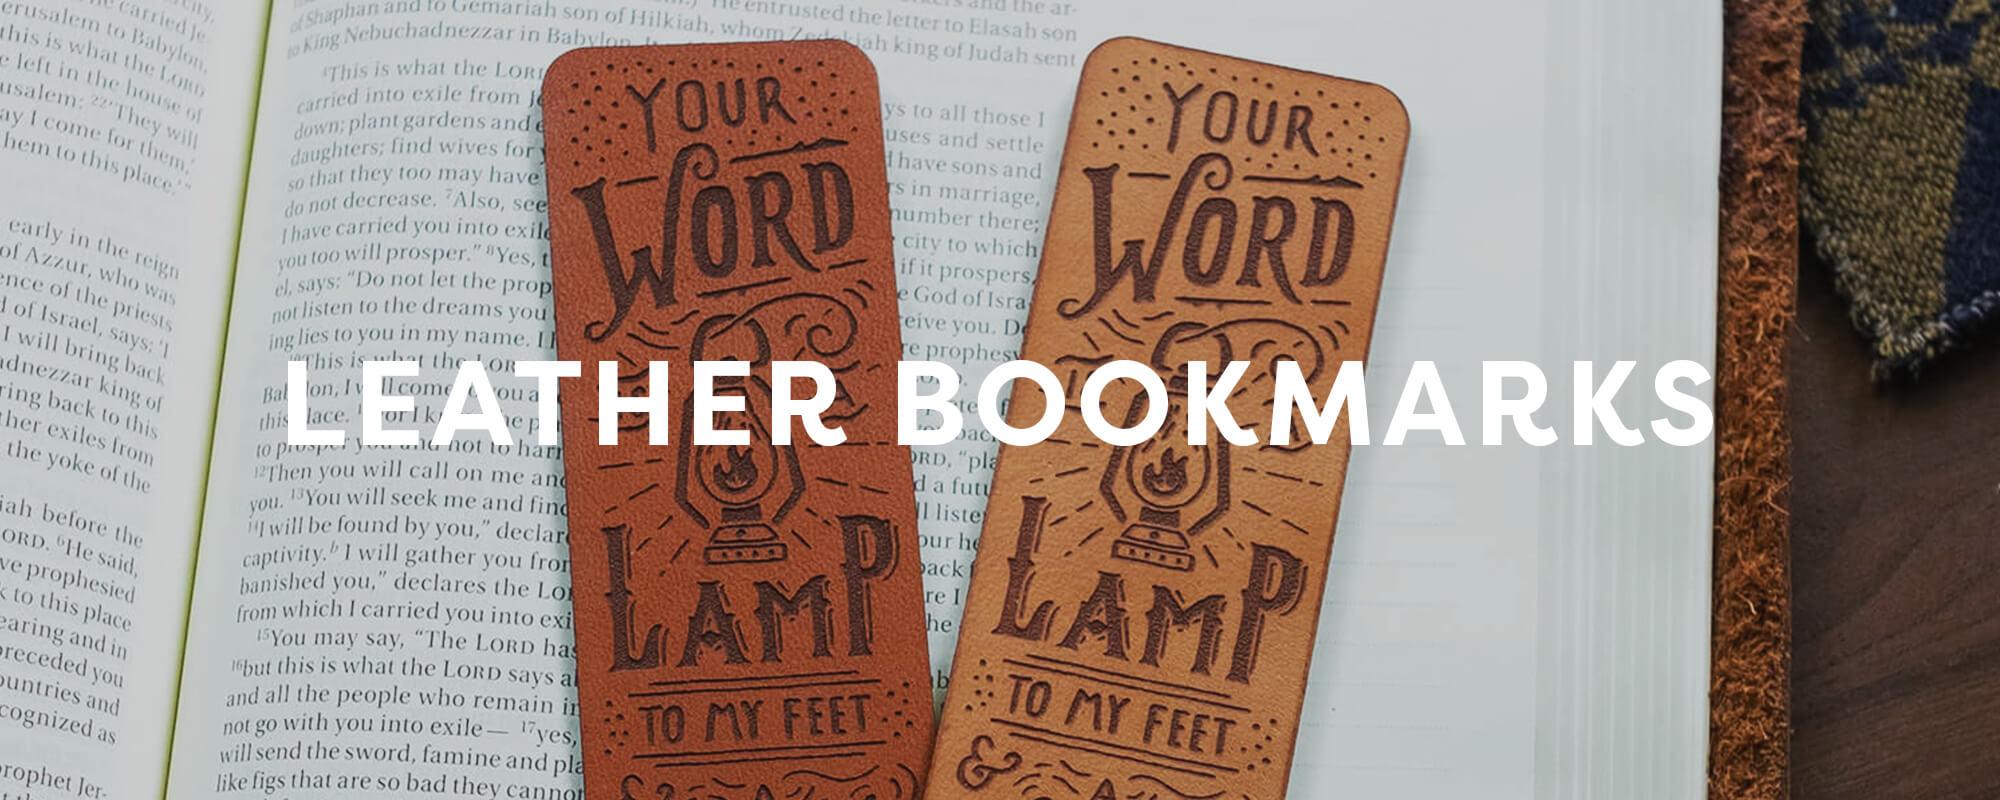 ScriptureType-LeatherBookmarks.jpg